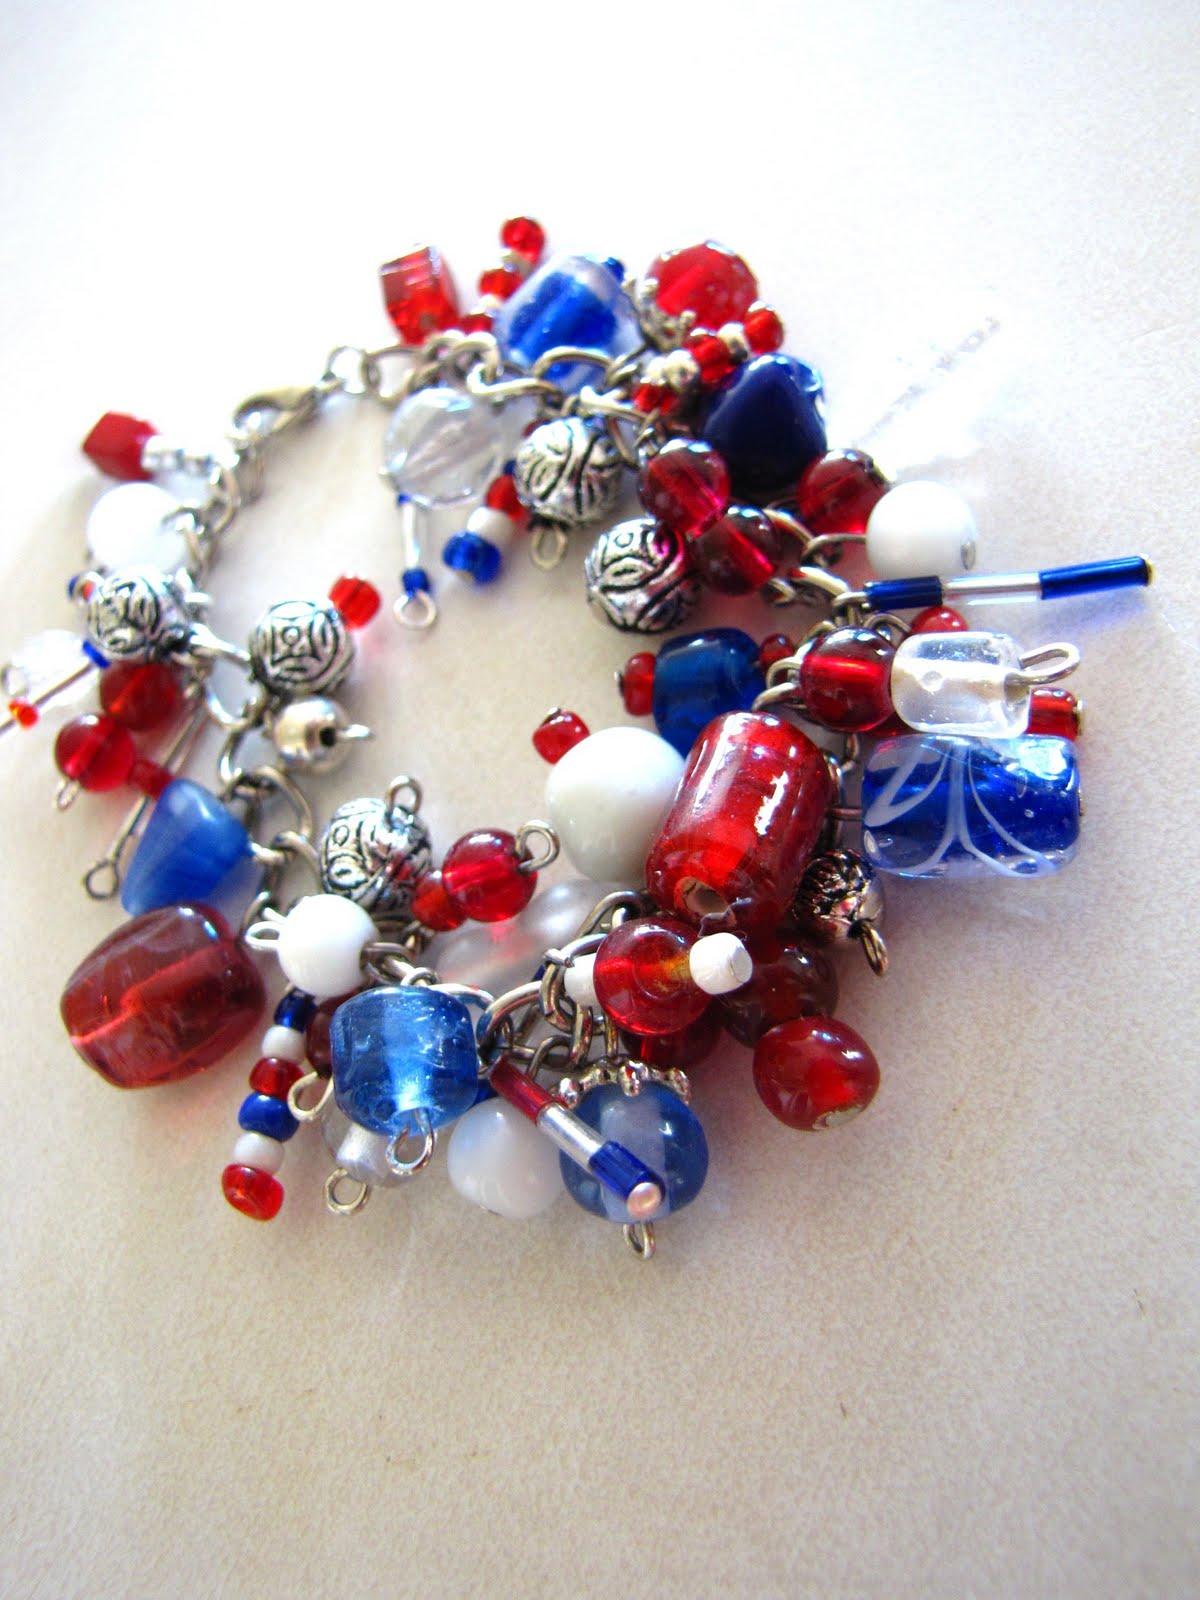 how to close snugfit bracelet